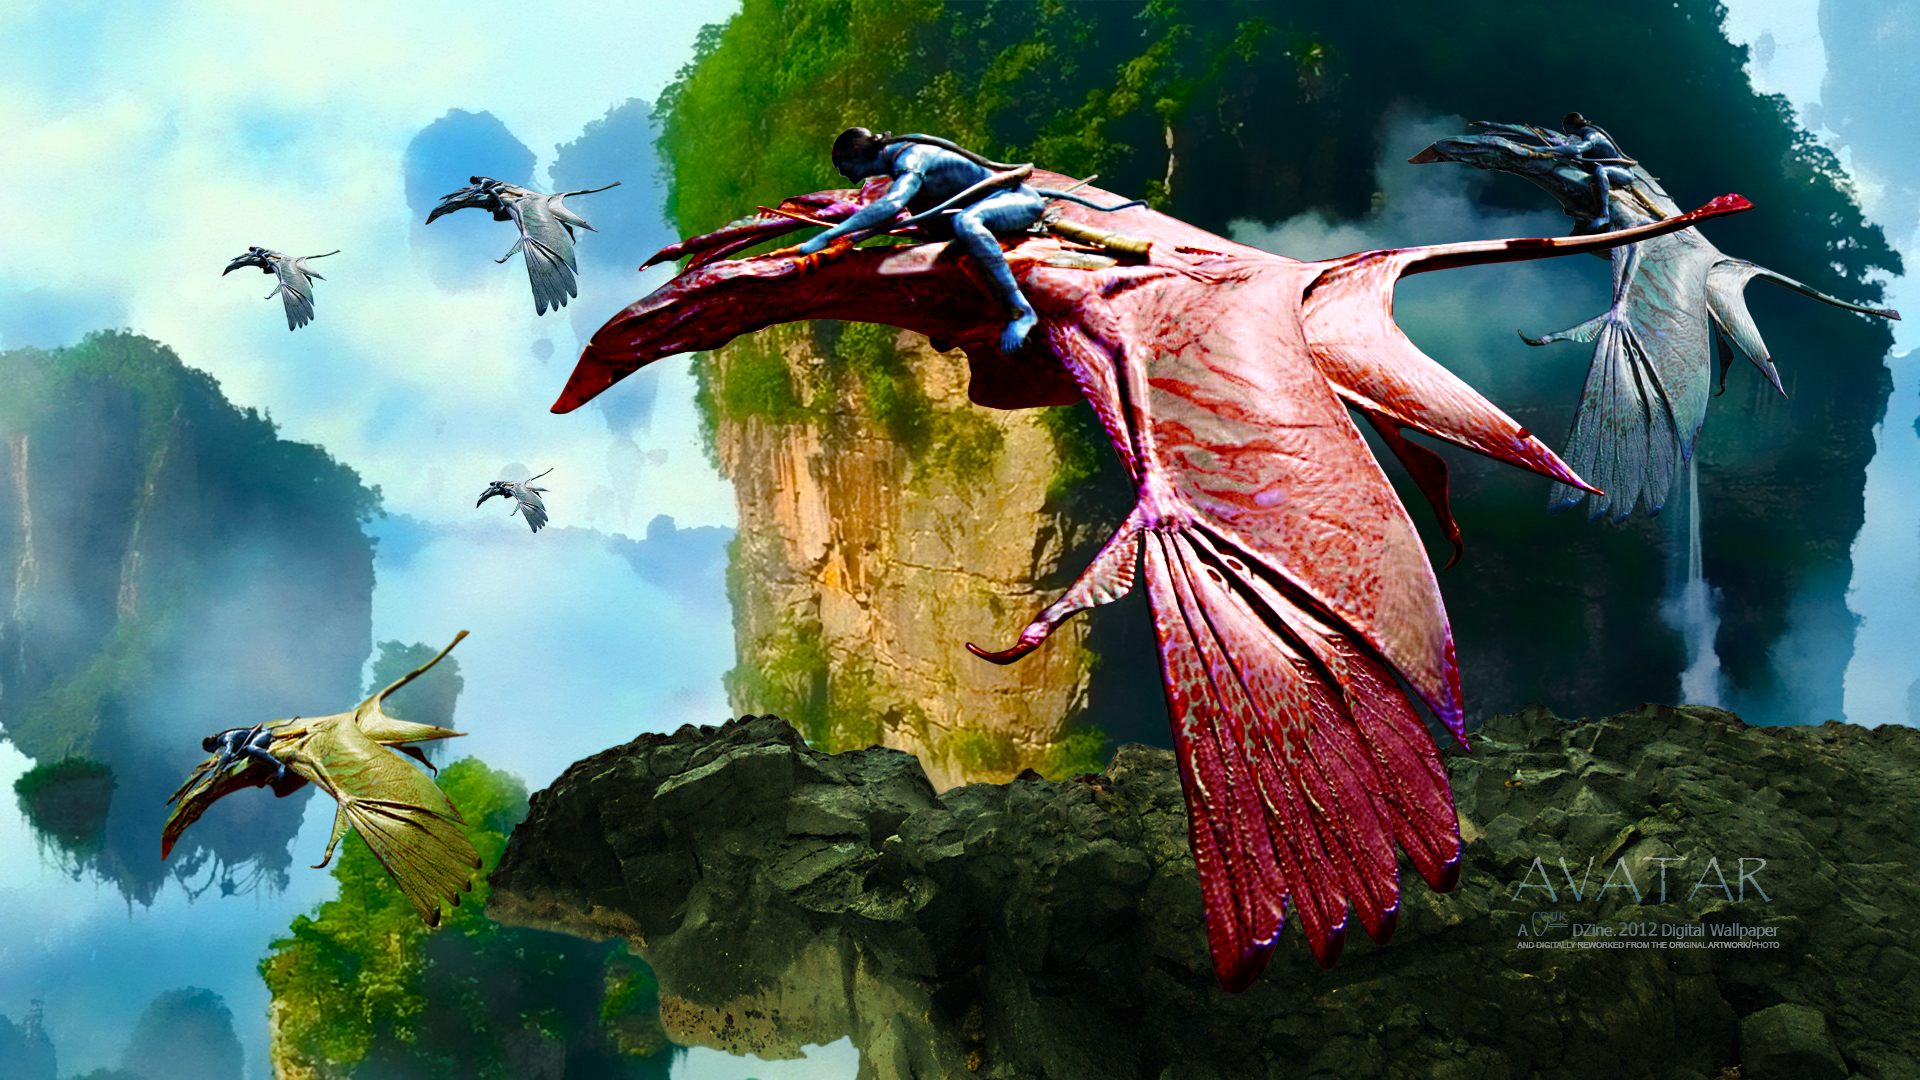 Must see Wallpaper Movie Avatar 2 - avatar__2__banshee_s_by_csuk_1t-d4yazvi  Image_646688.jpg